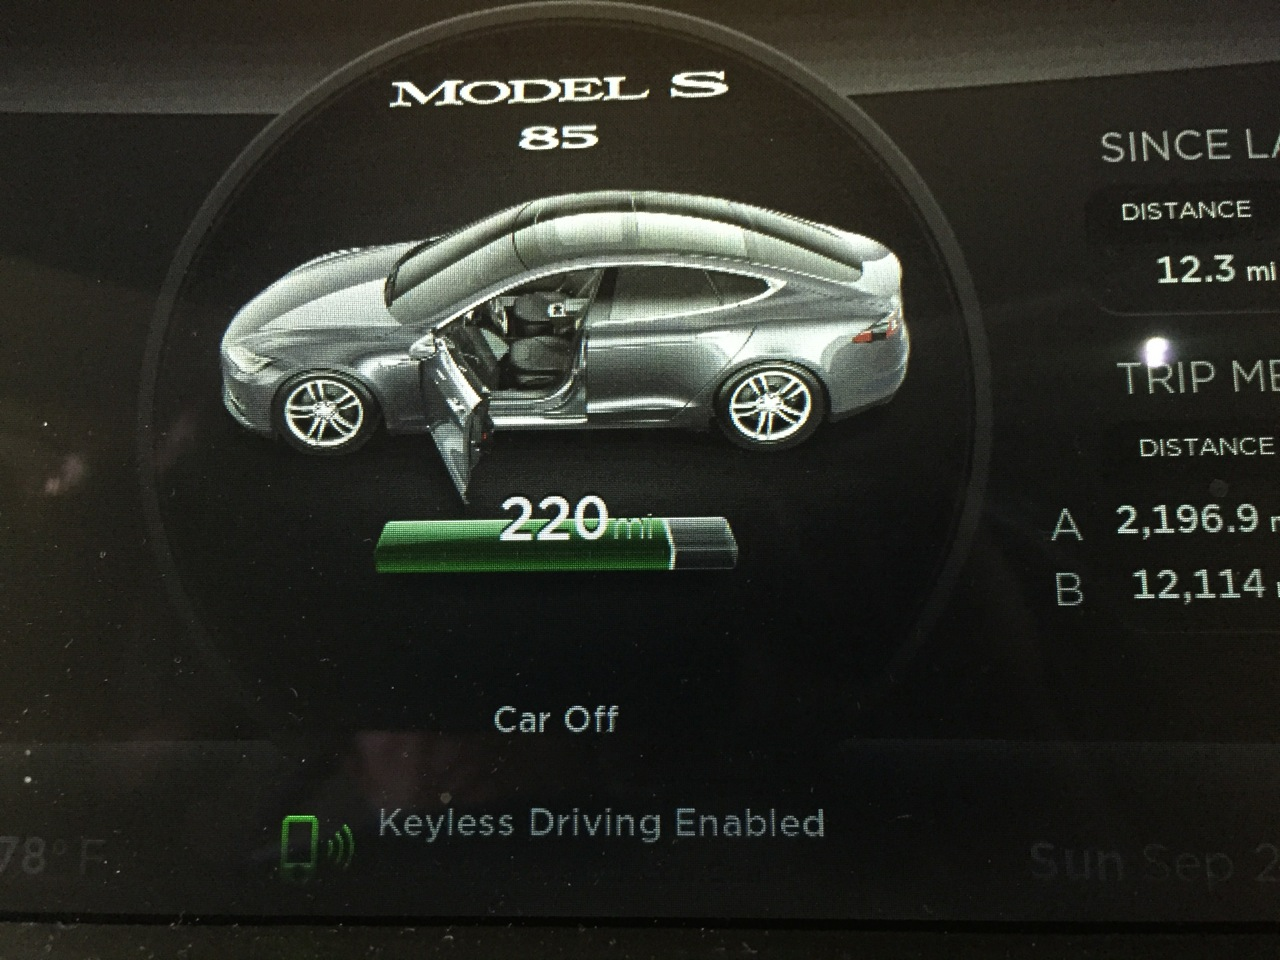 Keyless indicator on dash